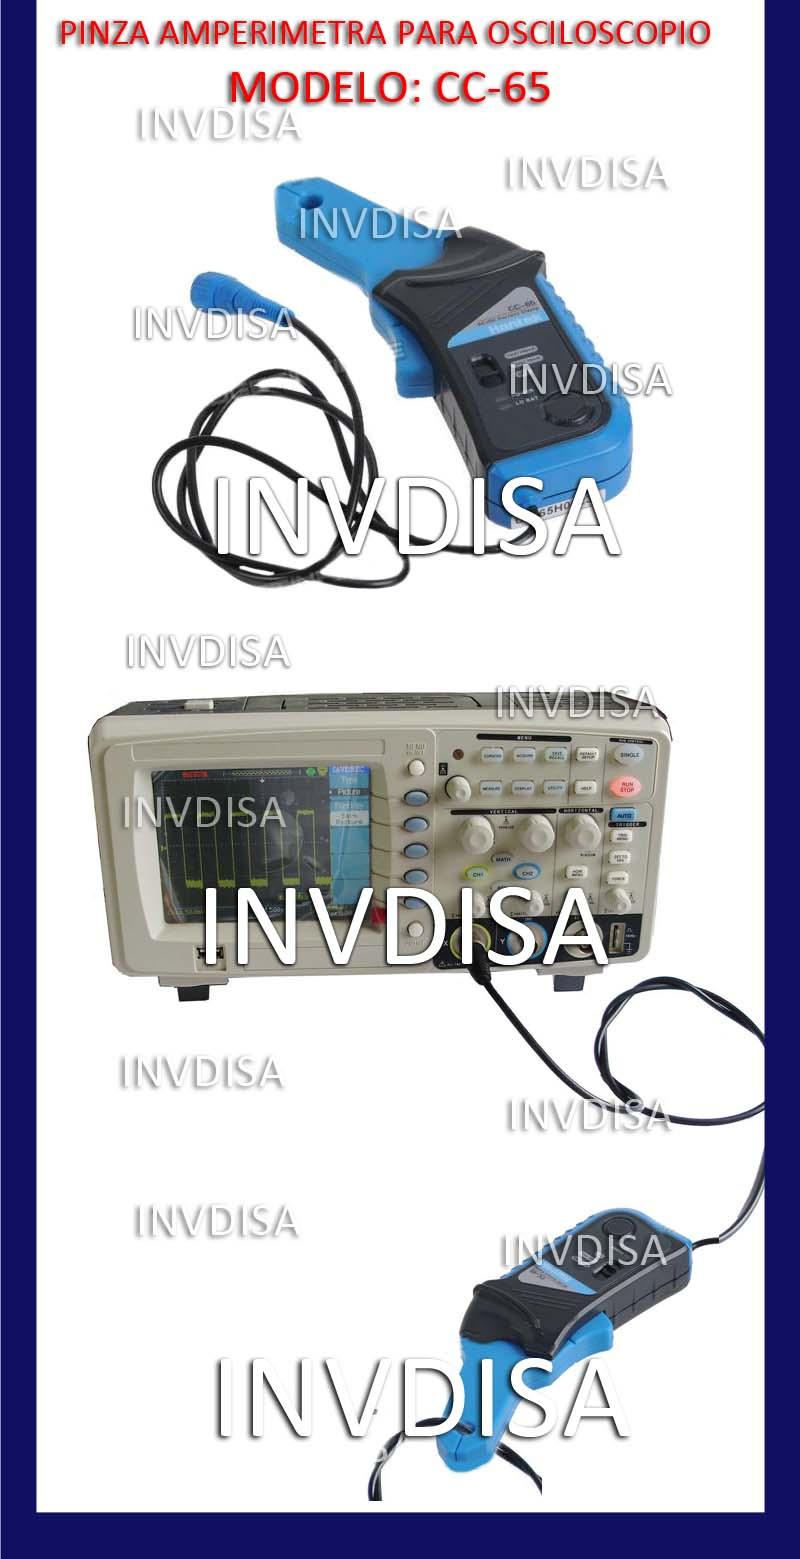 http://www.invdisa.com/ML/AppalCC65